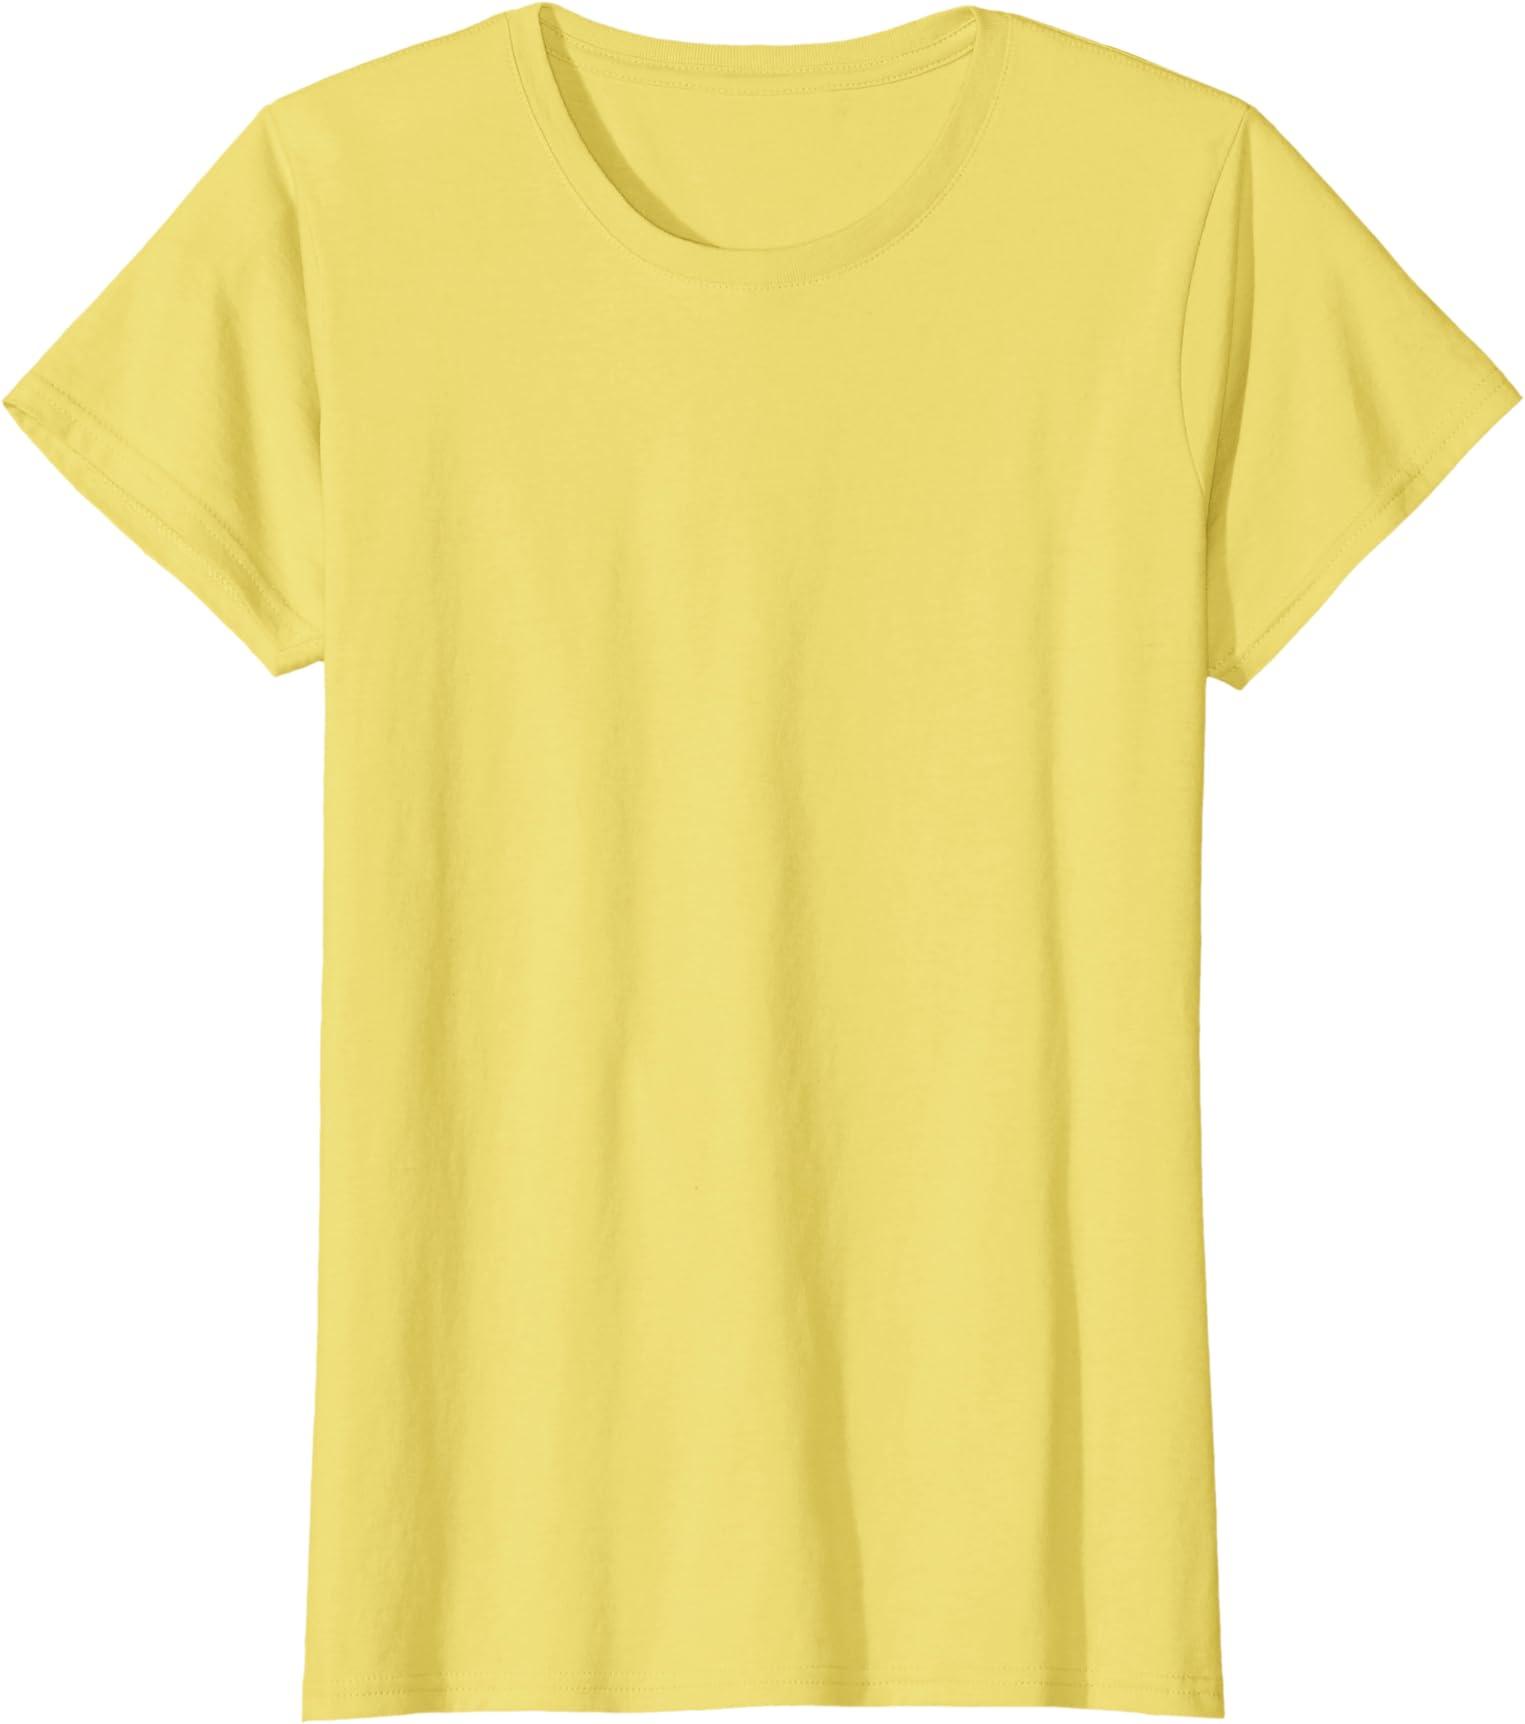 Cartwright Surname Mens T-Shirt 100/% Gift Name Family Cool Fun